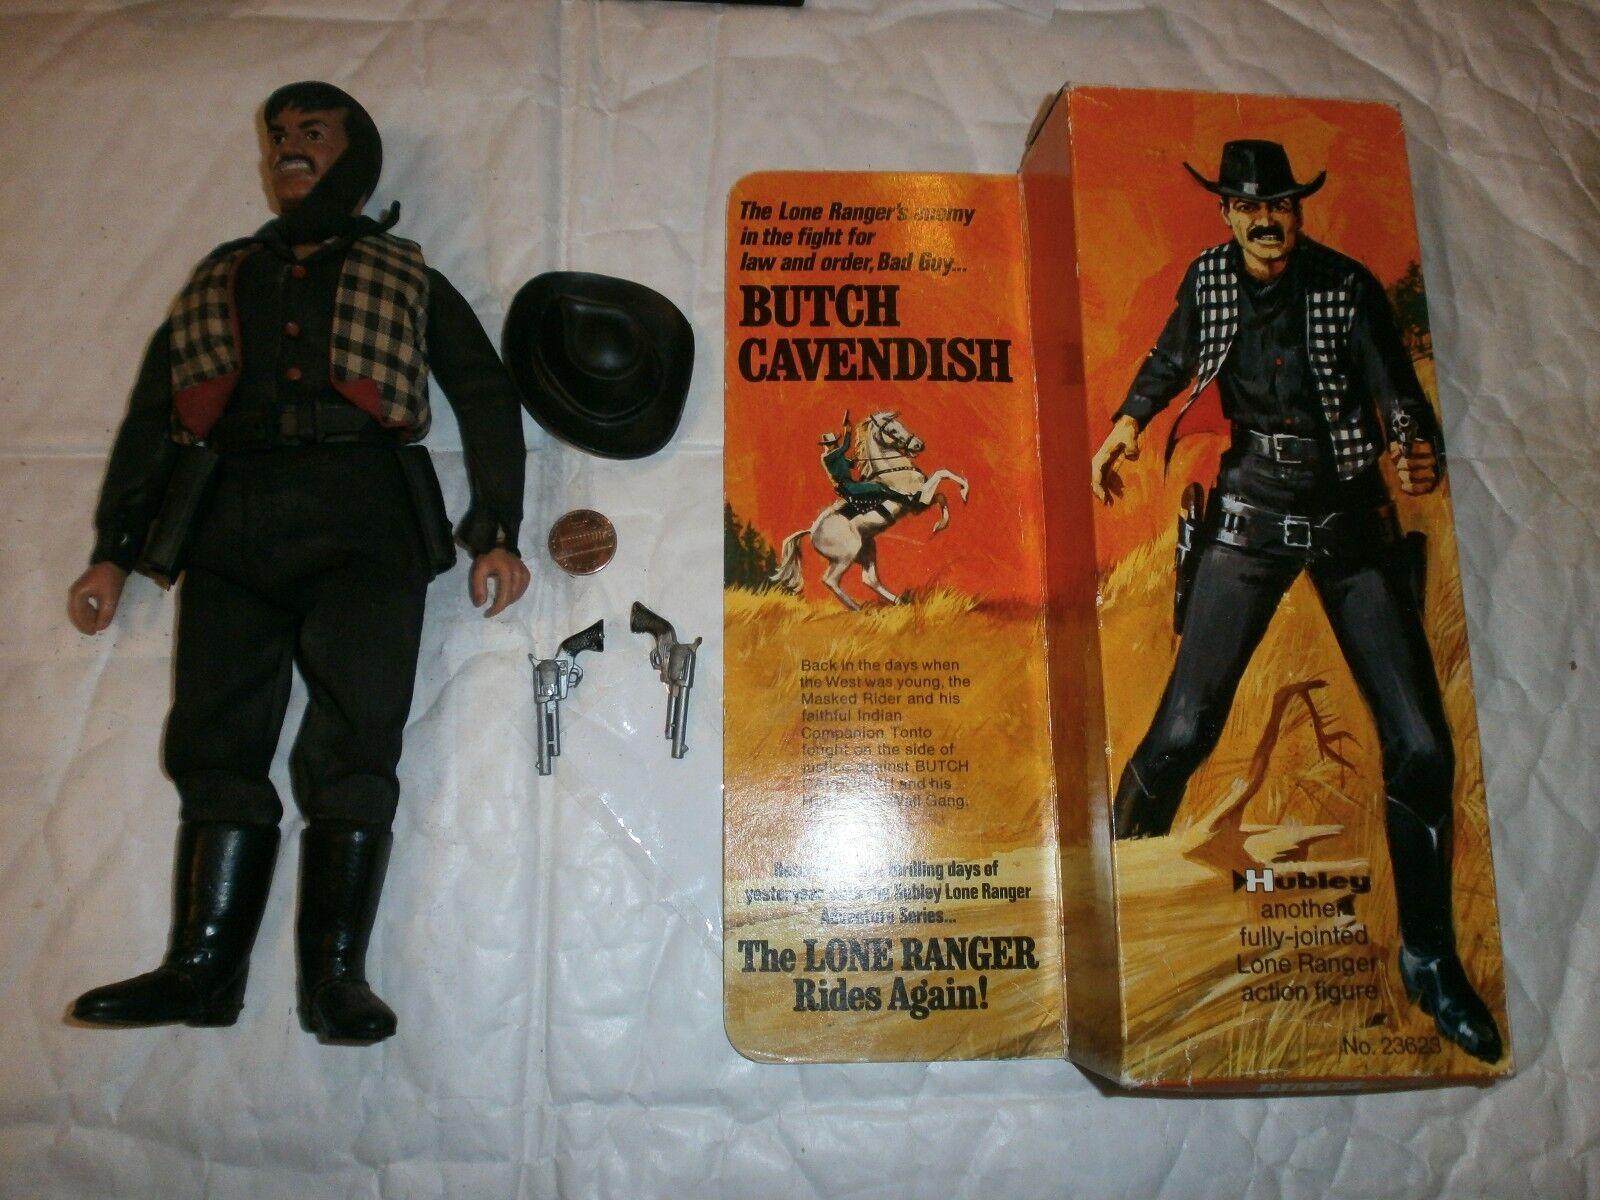 Lone Ranger Butch Cavendish Cavendish Cavendish boxed figure Hubley 23623 1973 586f15